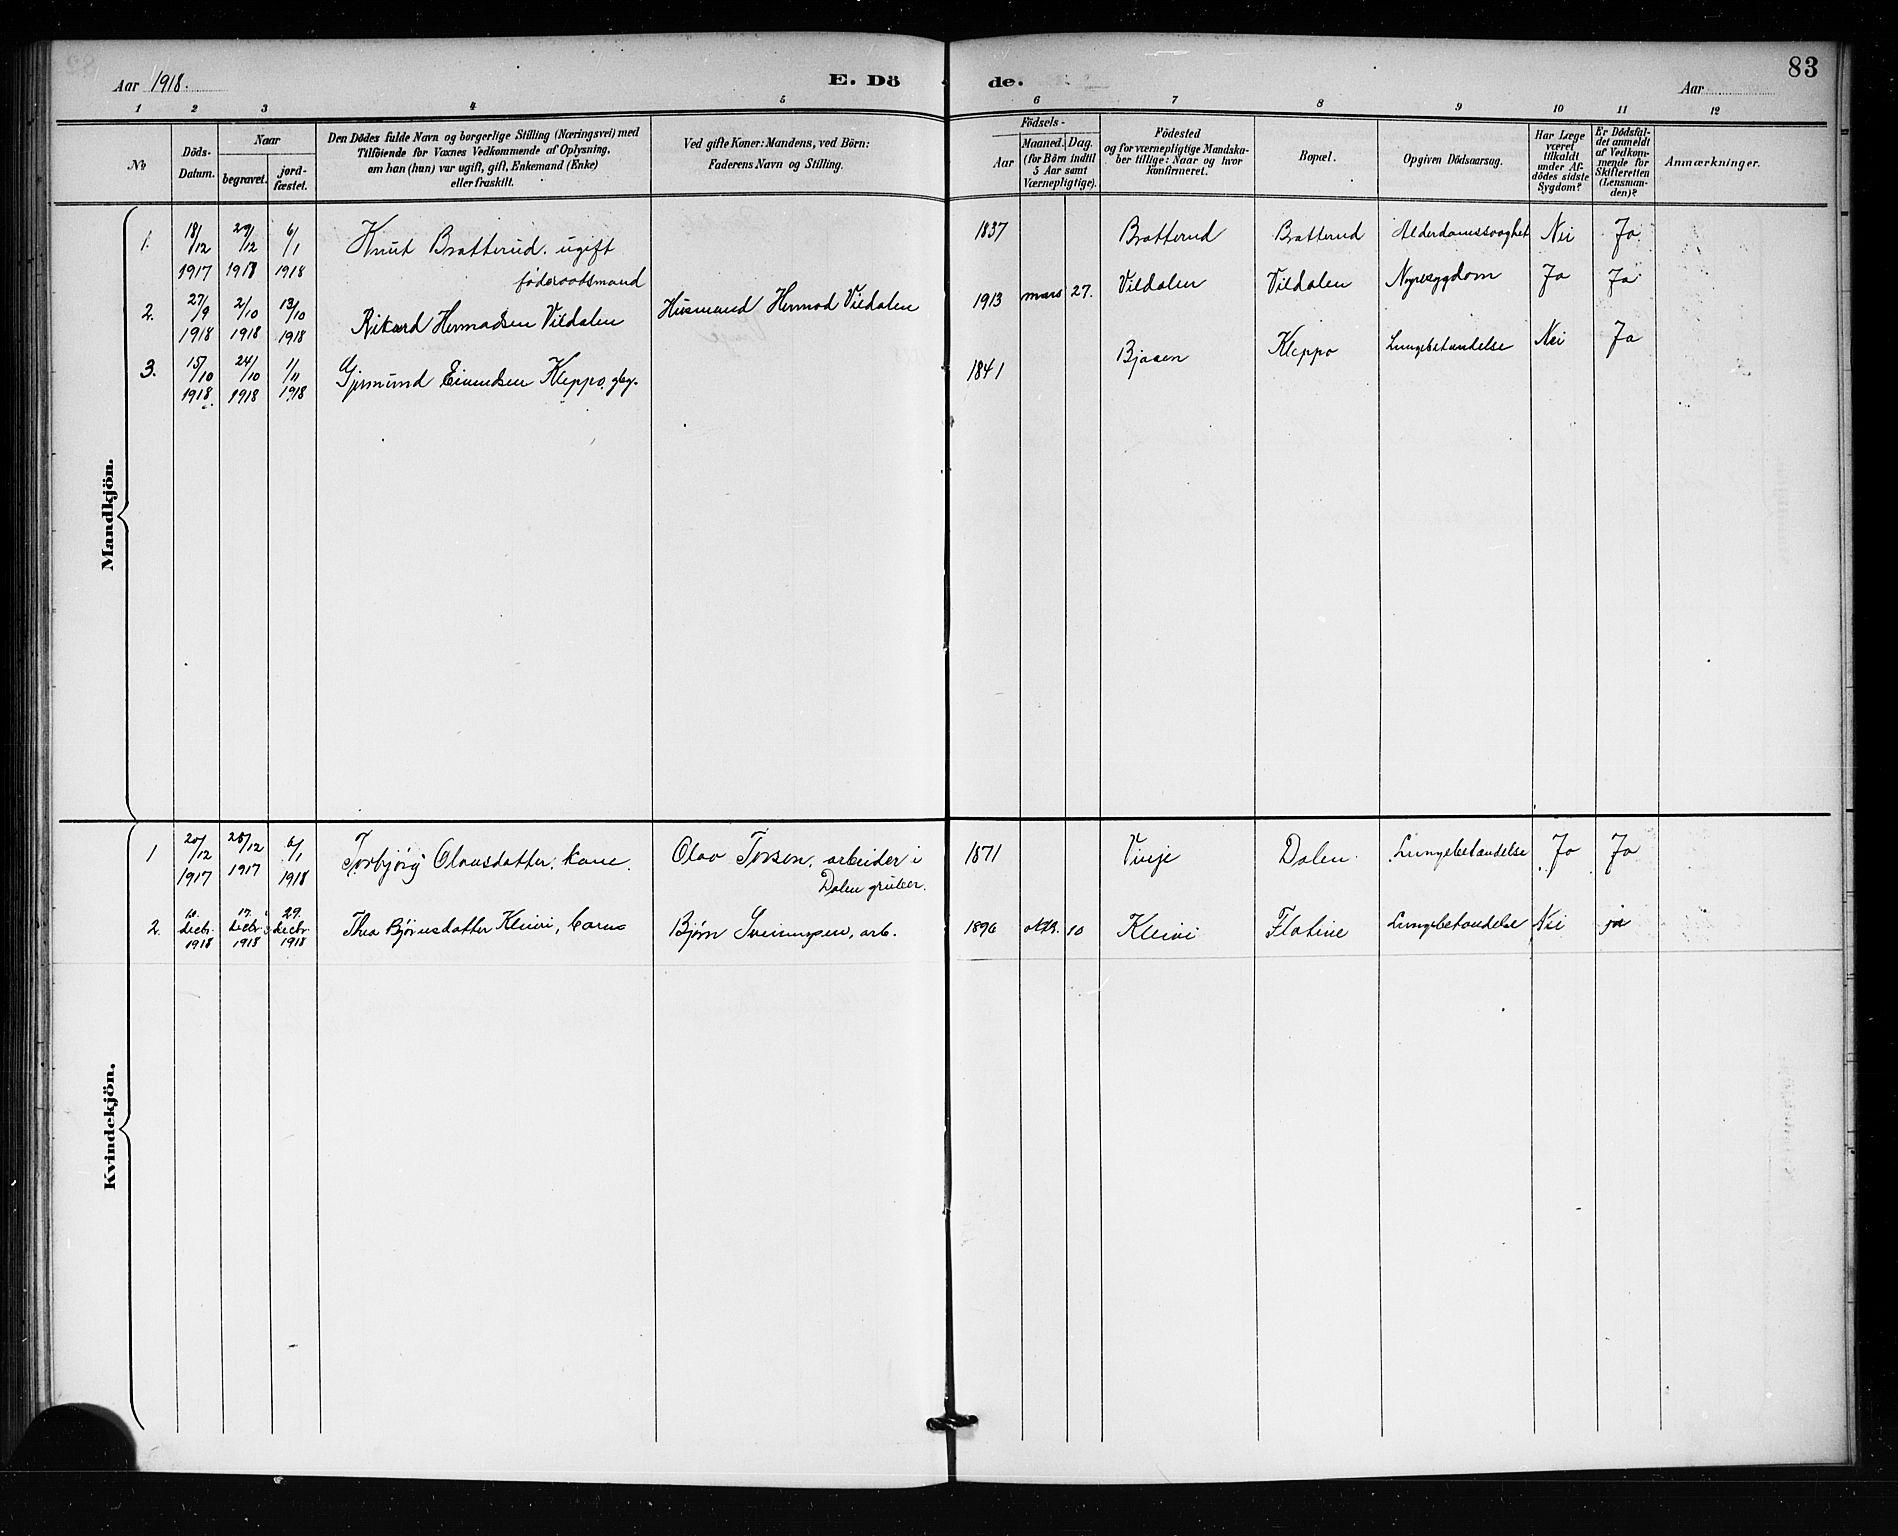 SAKO, Lårdal kirkebøker, G/Gb/L0003: Klokkerbok nr. II 3, 1889-1920, s. 83